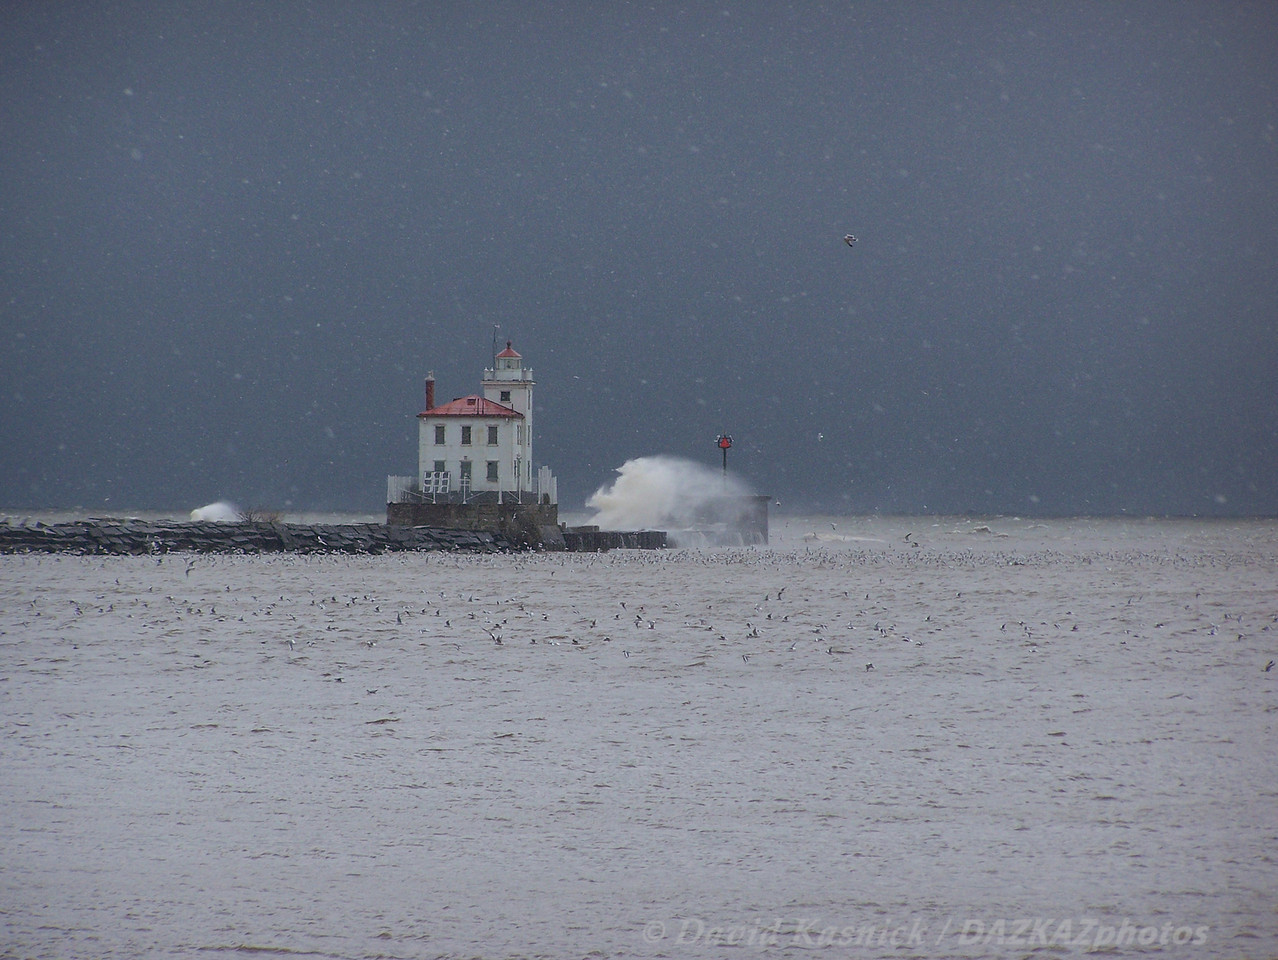 Fairport Harbor Breakwater Lighthouse - Fairport Harbor, OH